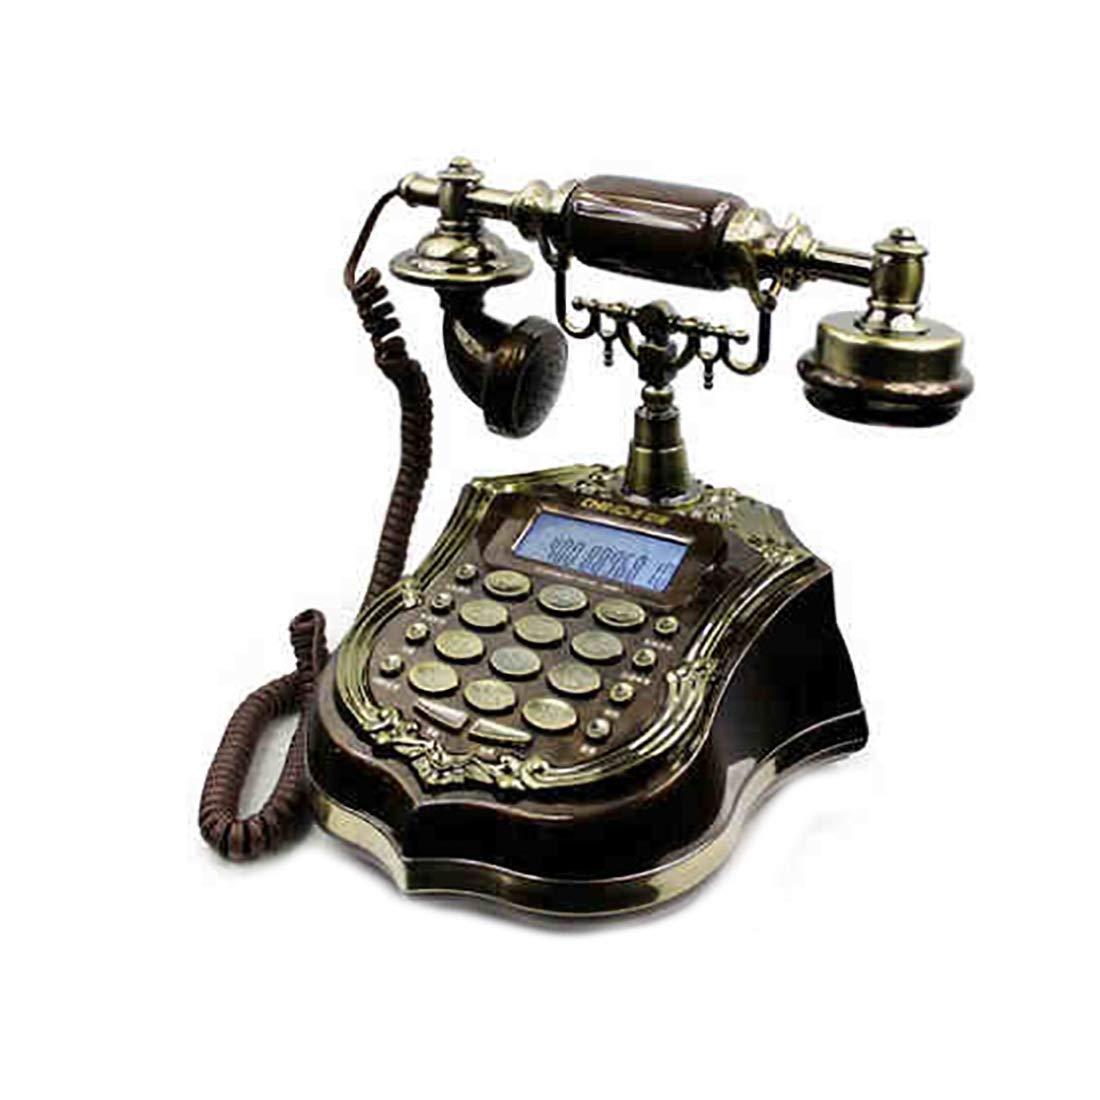 ZHILIAN Bronze European Retro Telephone Landline Home Fixed Telephone Metal Frame and Natural Resin